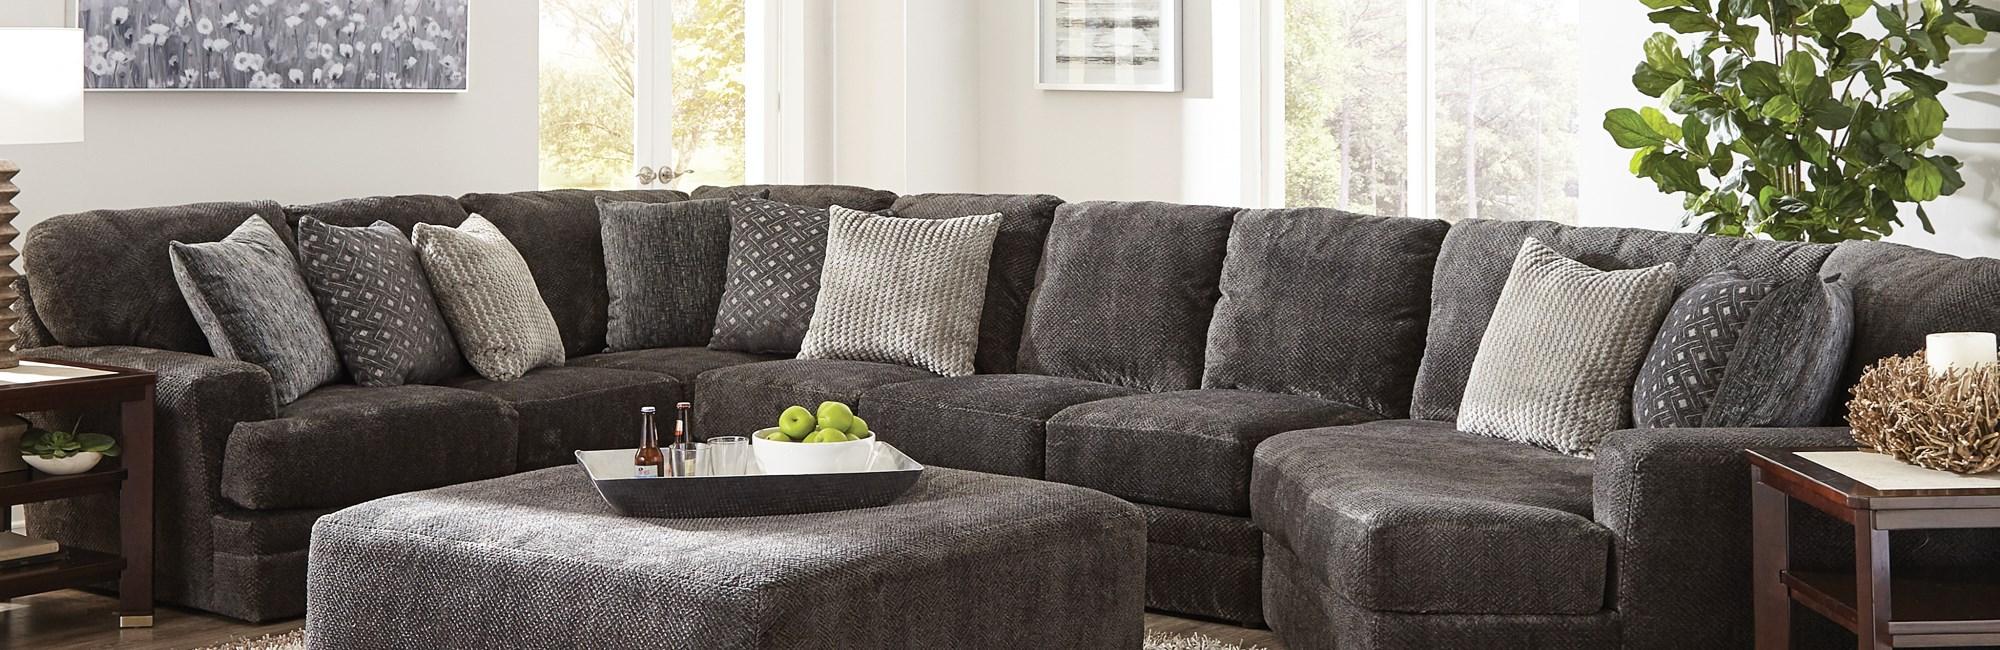 Shop Living Room Furniture At Ruby Gordon Home | Rochester pertaining to Ruby Gordon Furniture Rochester Ny